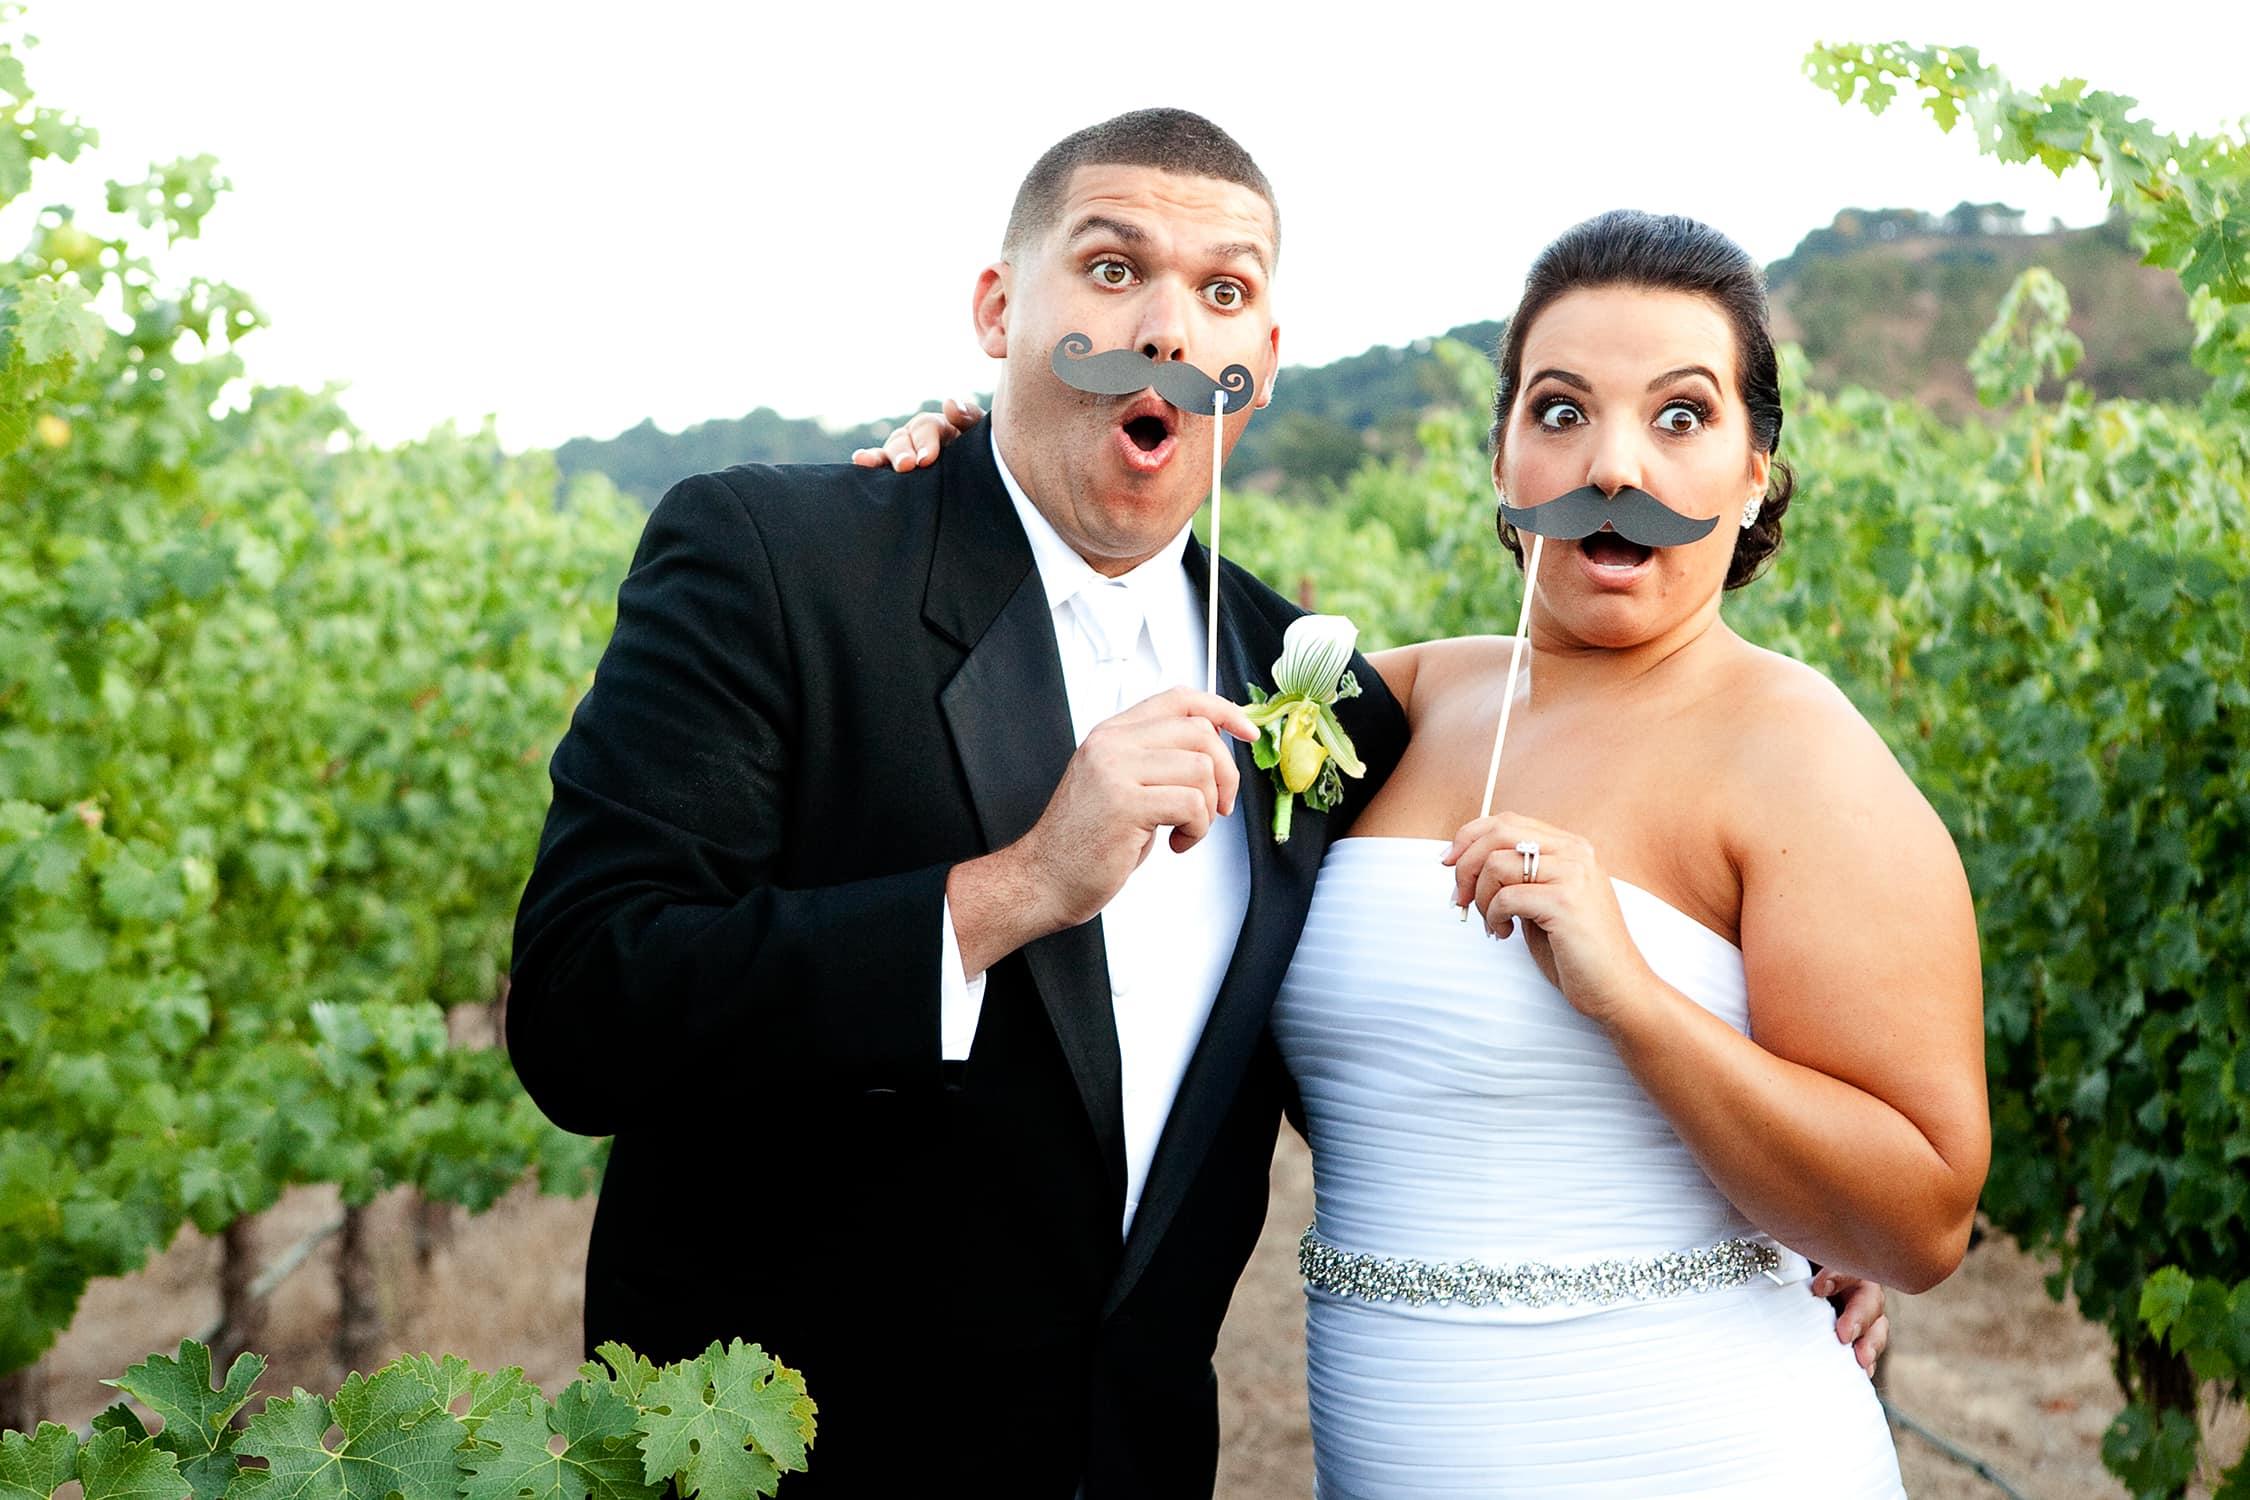 Bride and Groom in Vineyard at clos la chance.